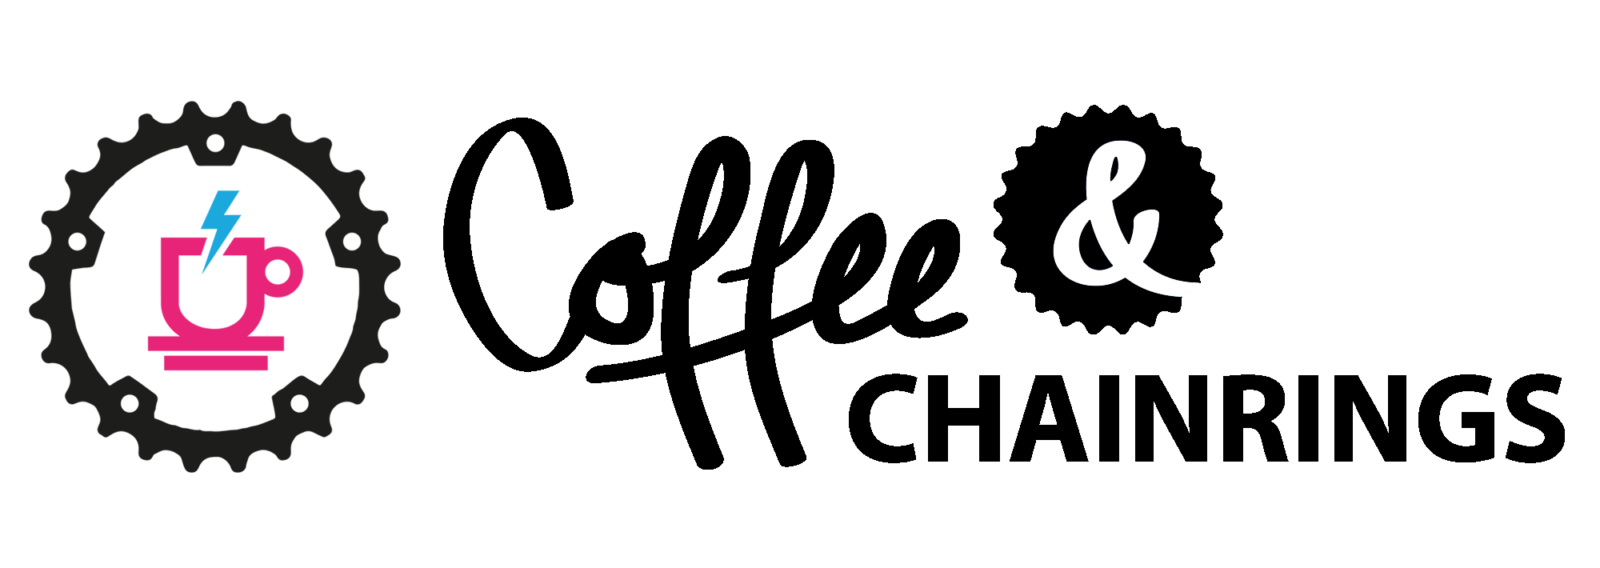 Coffee & Chainrings Mountainbike Verein e.V.